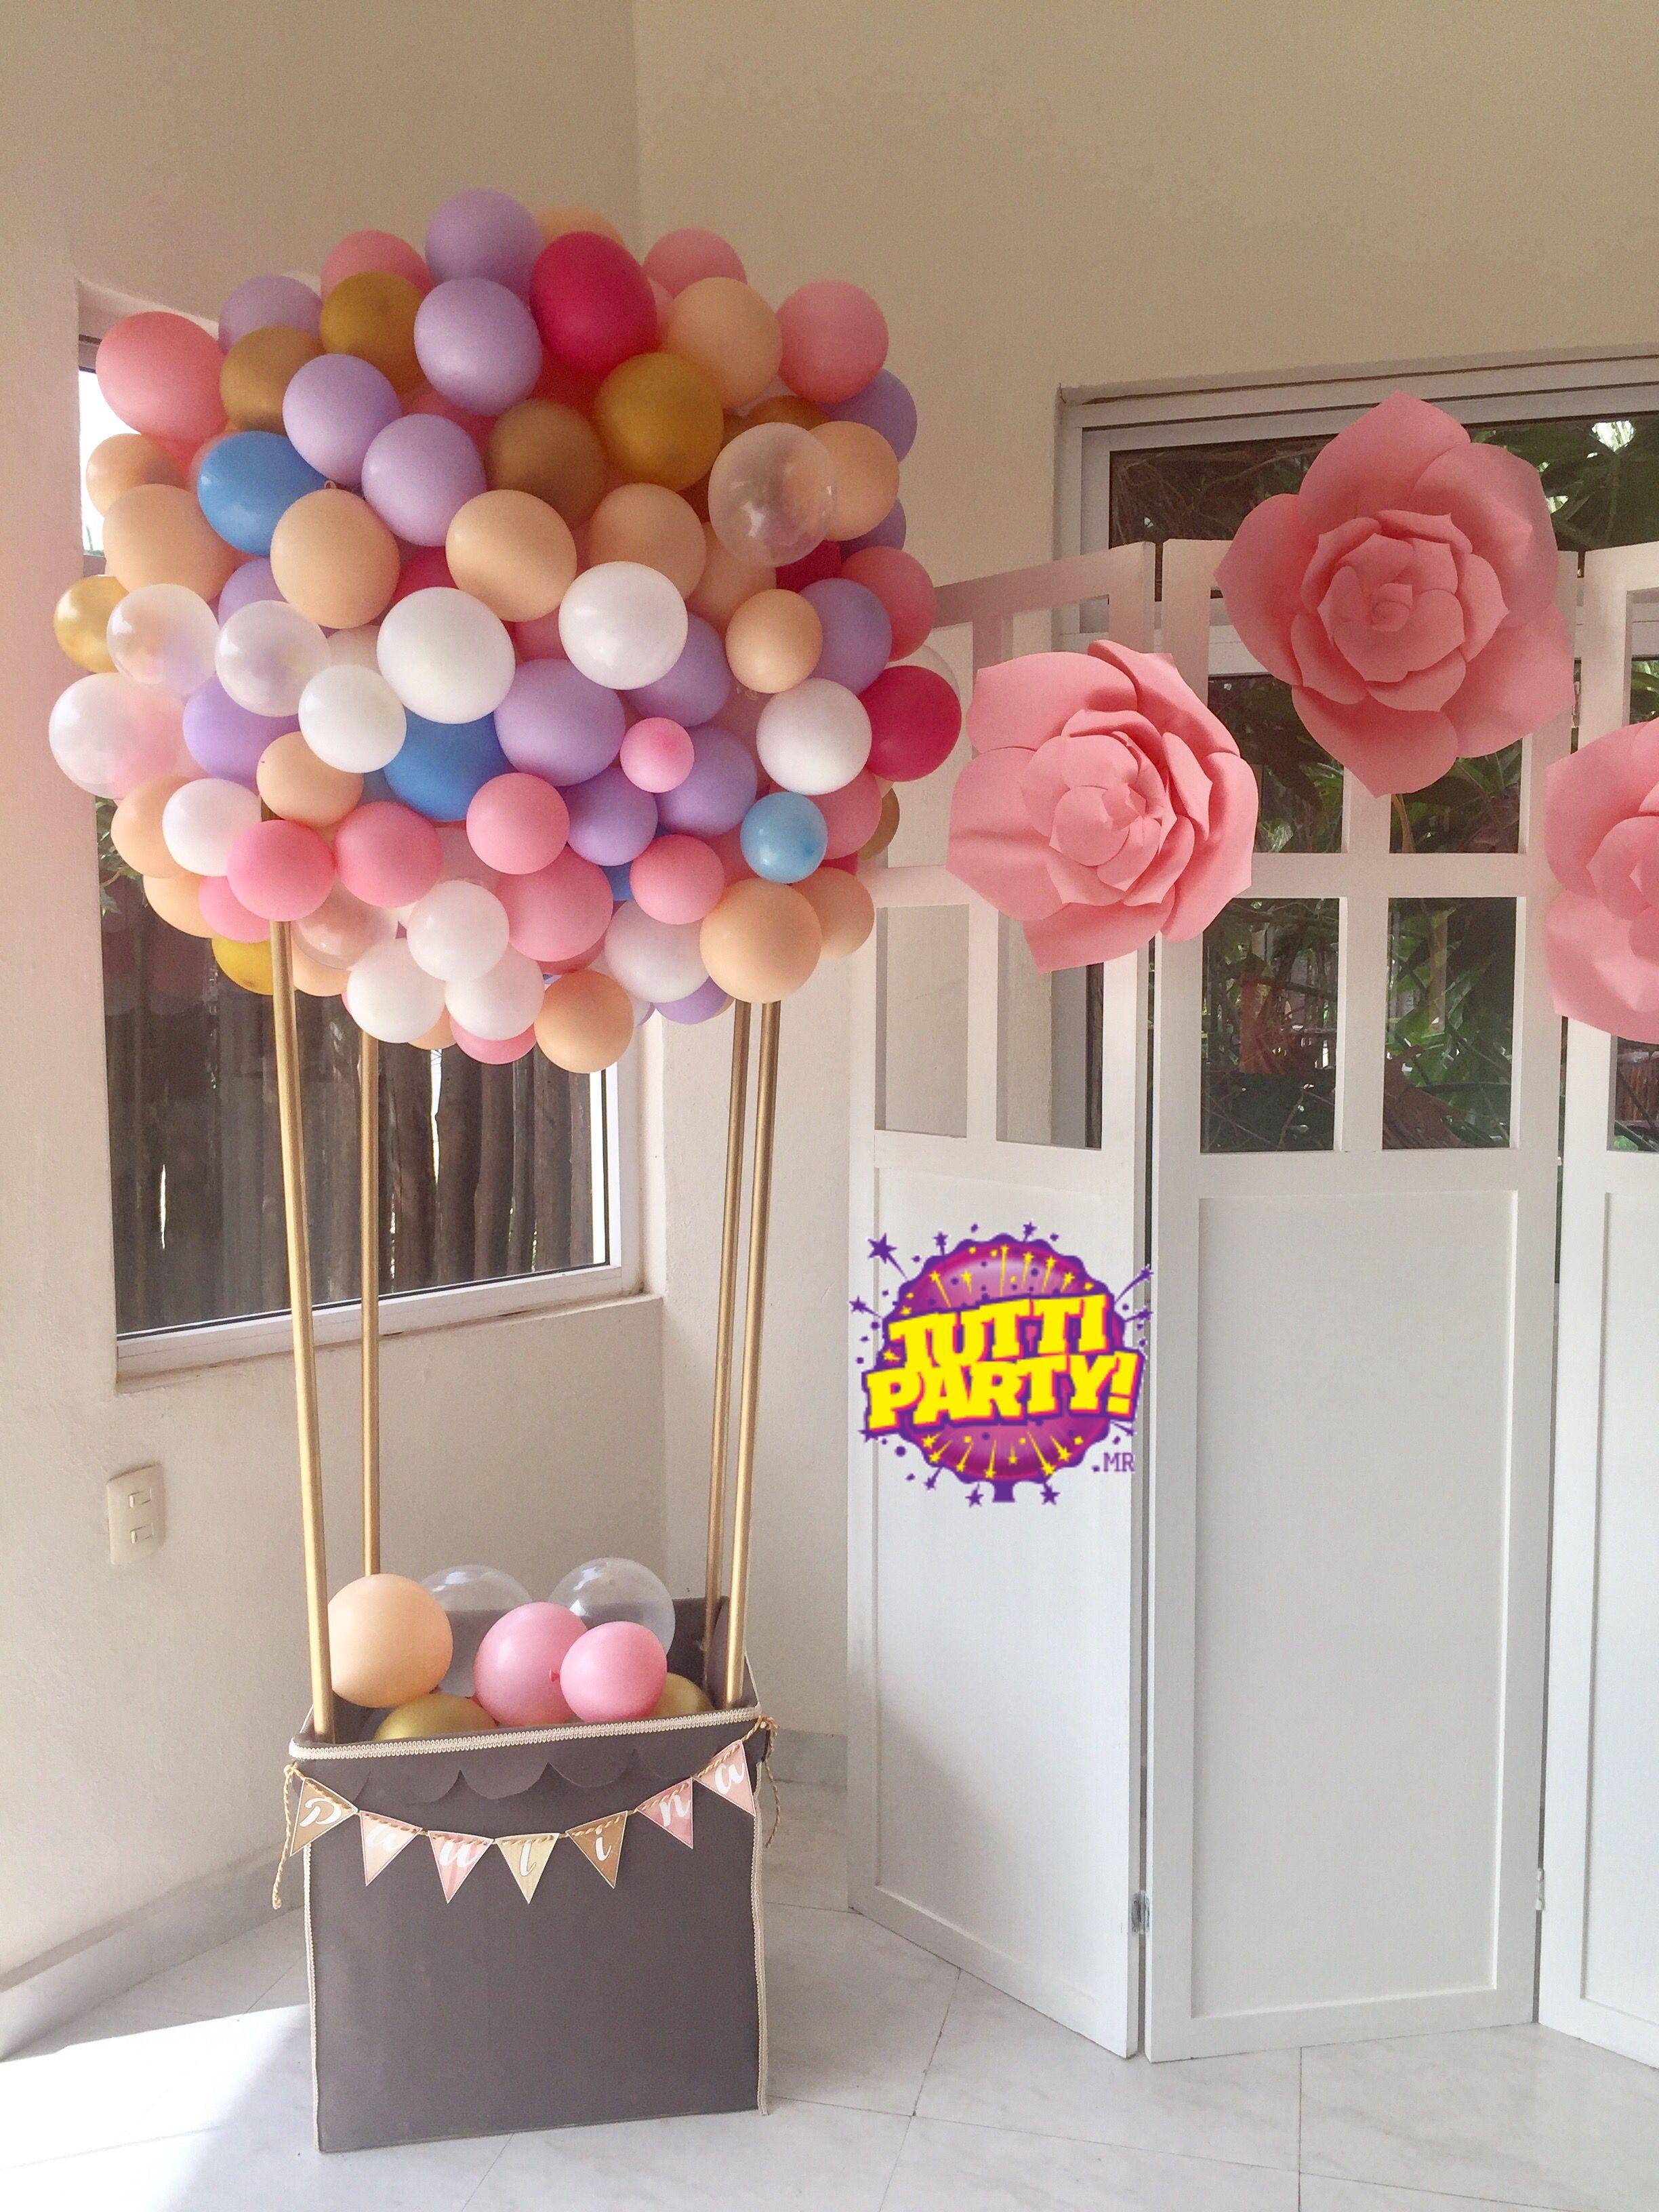 Hot Air Balloon Party Decorations Hot Air Balloon Party